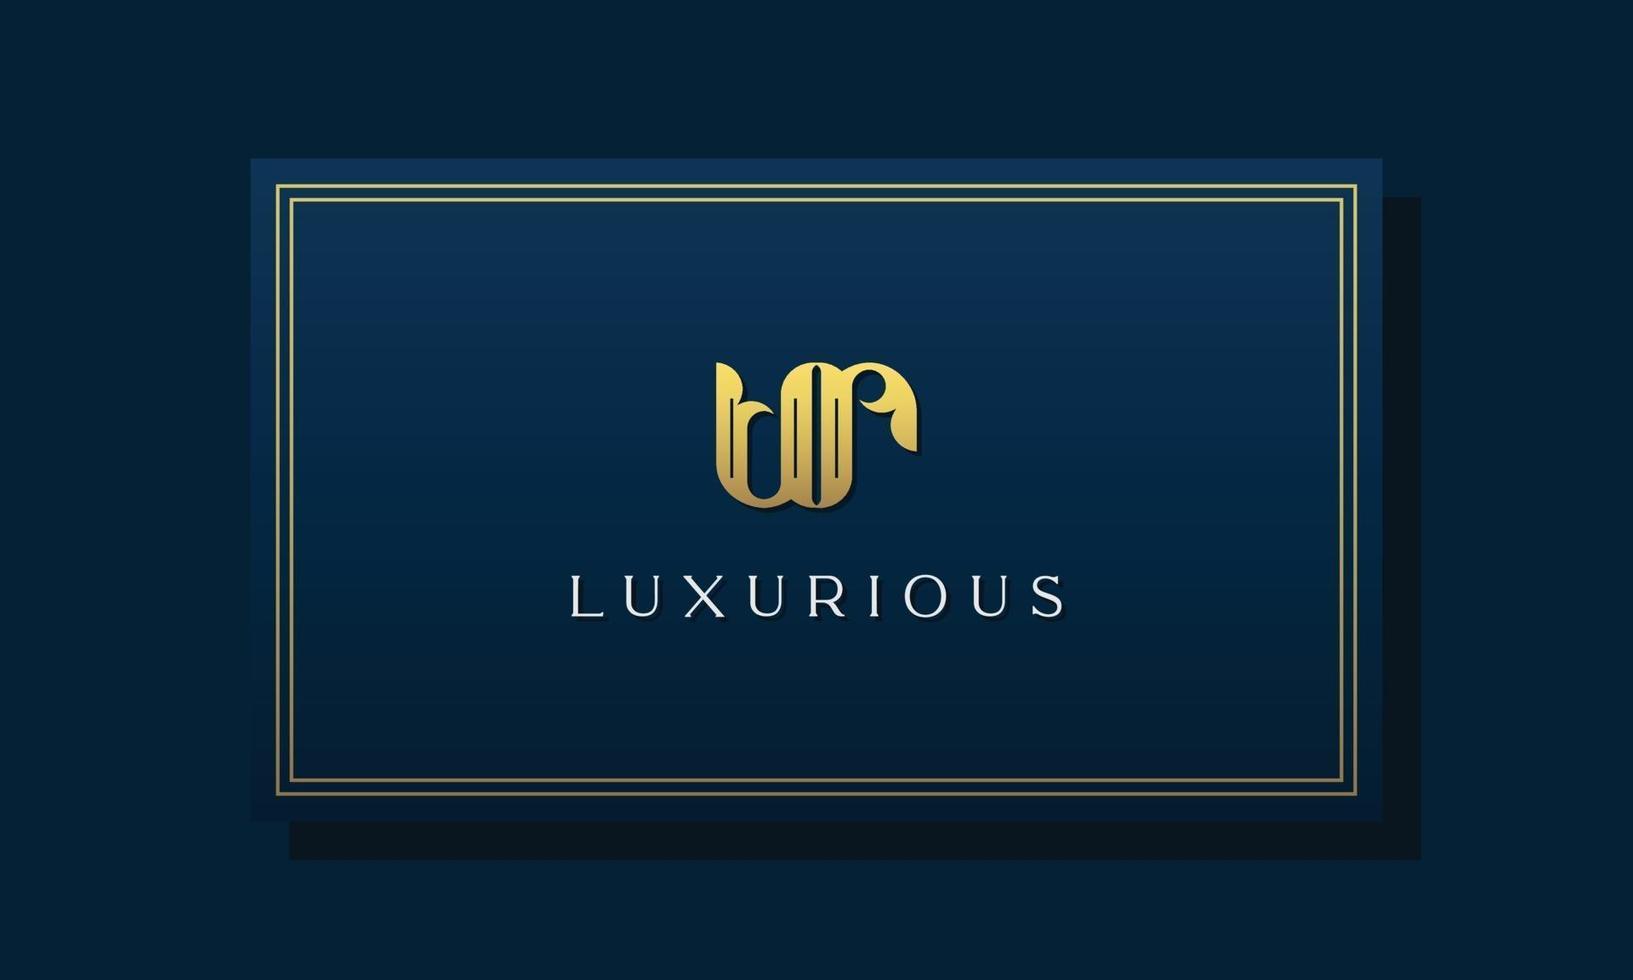 Vintage royal initial letters UR logo. vector